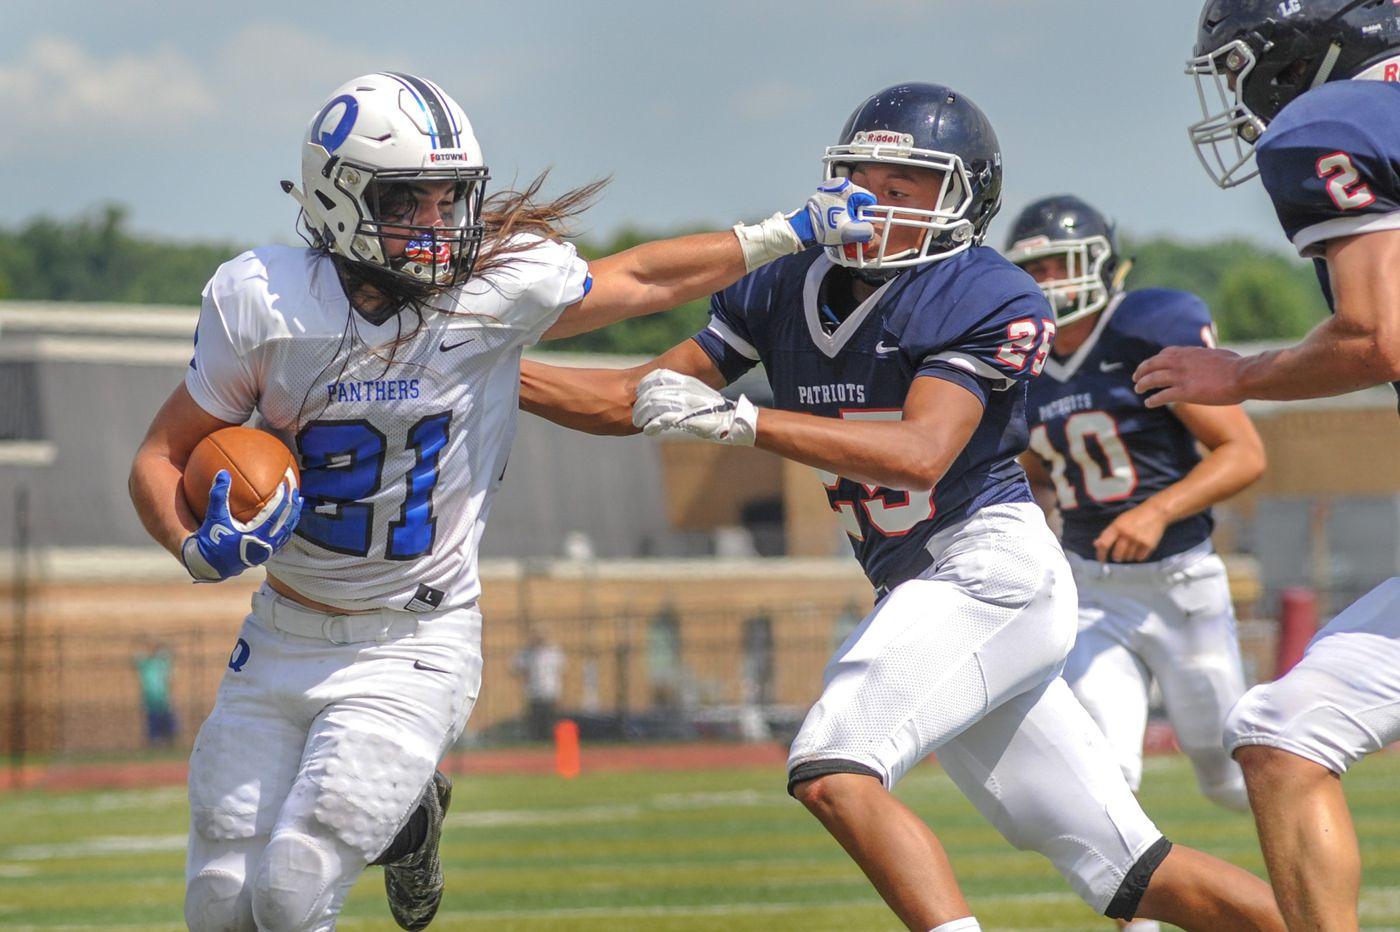 Wanna watch football? Southeastern Pa.'s Week 3 high school football schedule